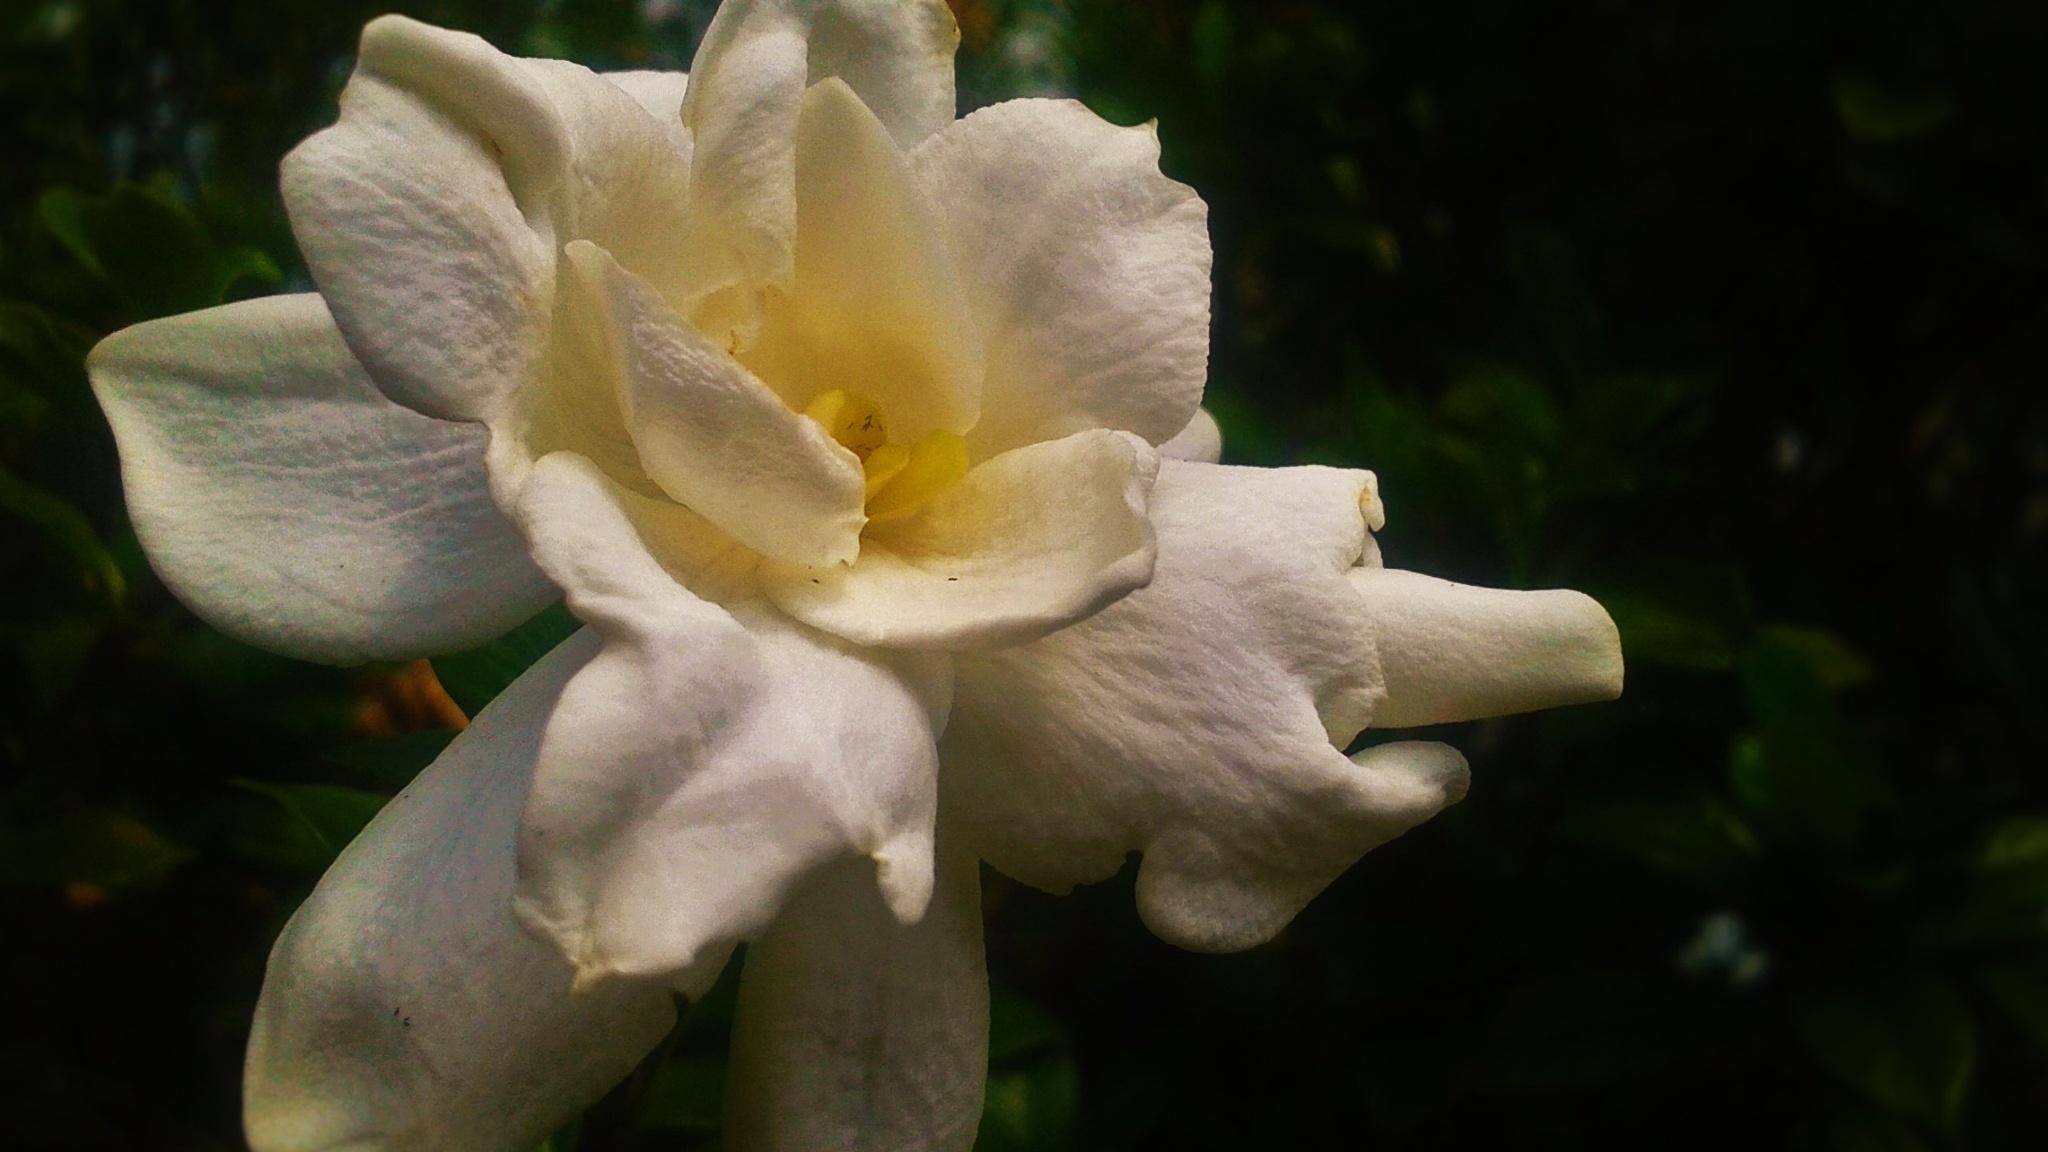 The Ever Fragrant Gardenia by Julie Piwaron